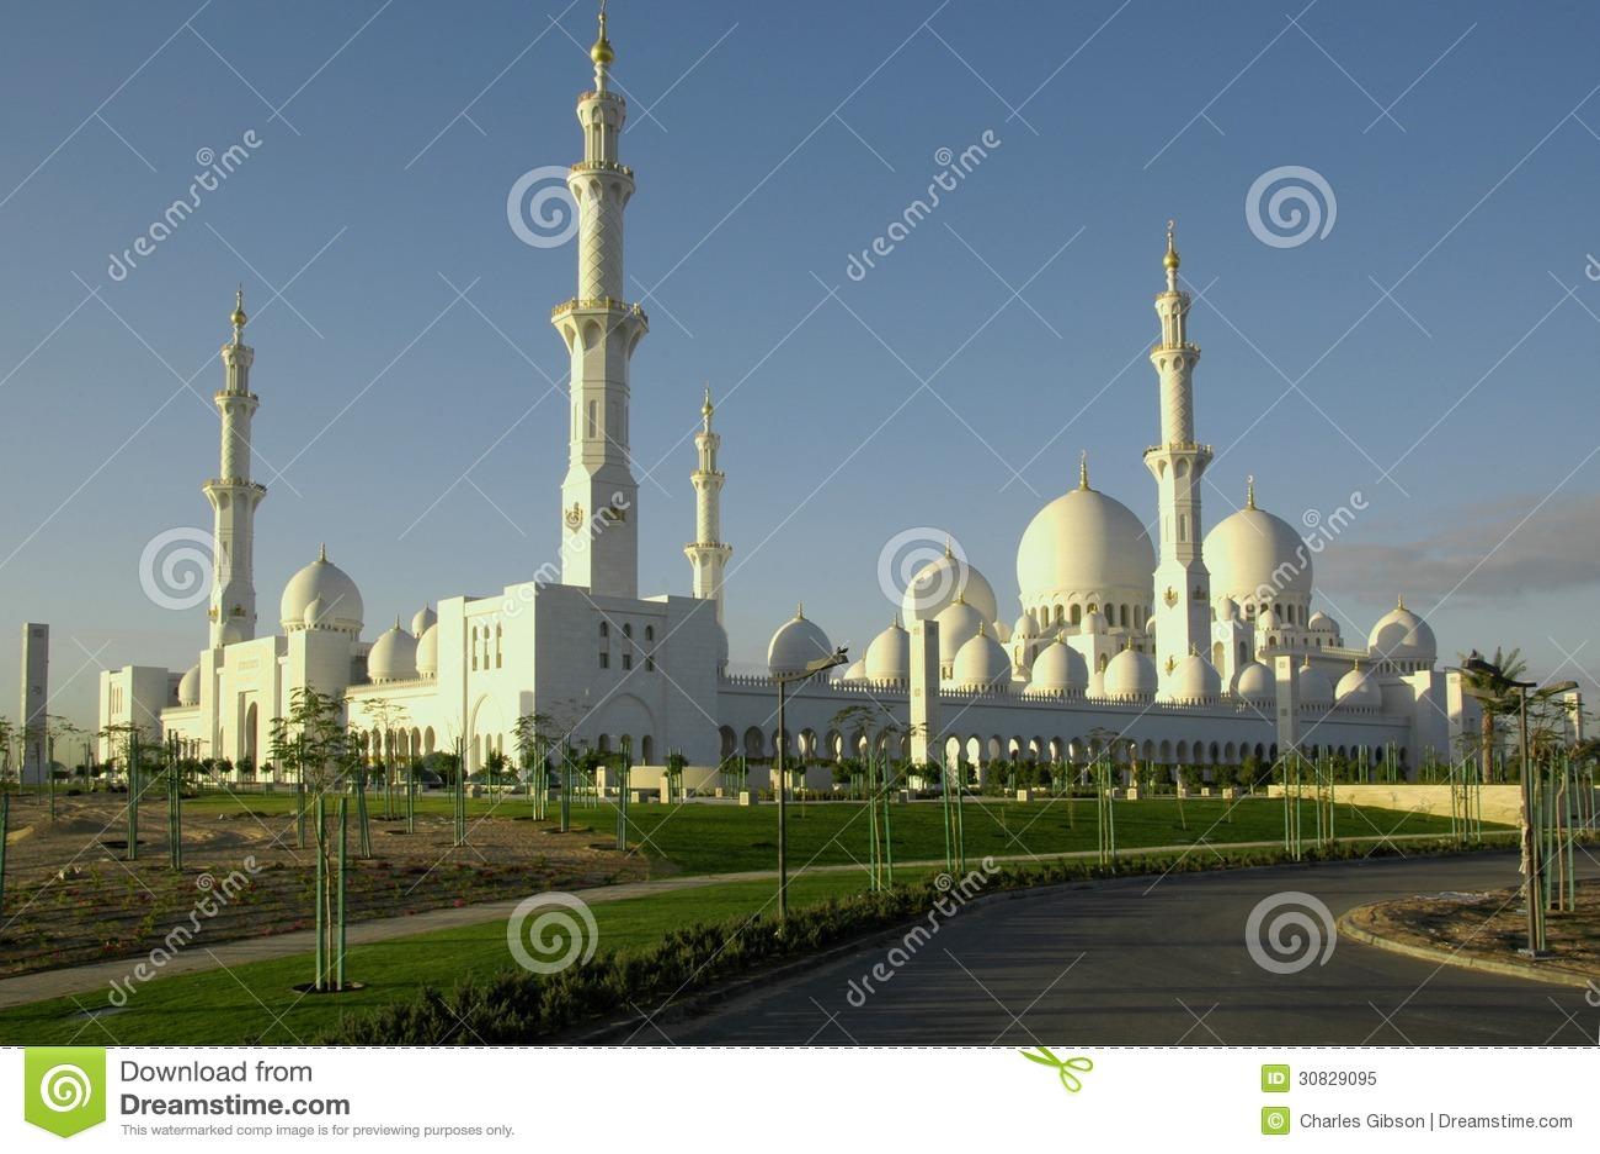 Sheikh Zayed Al Nayhan Mosque